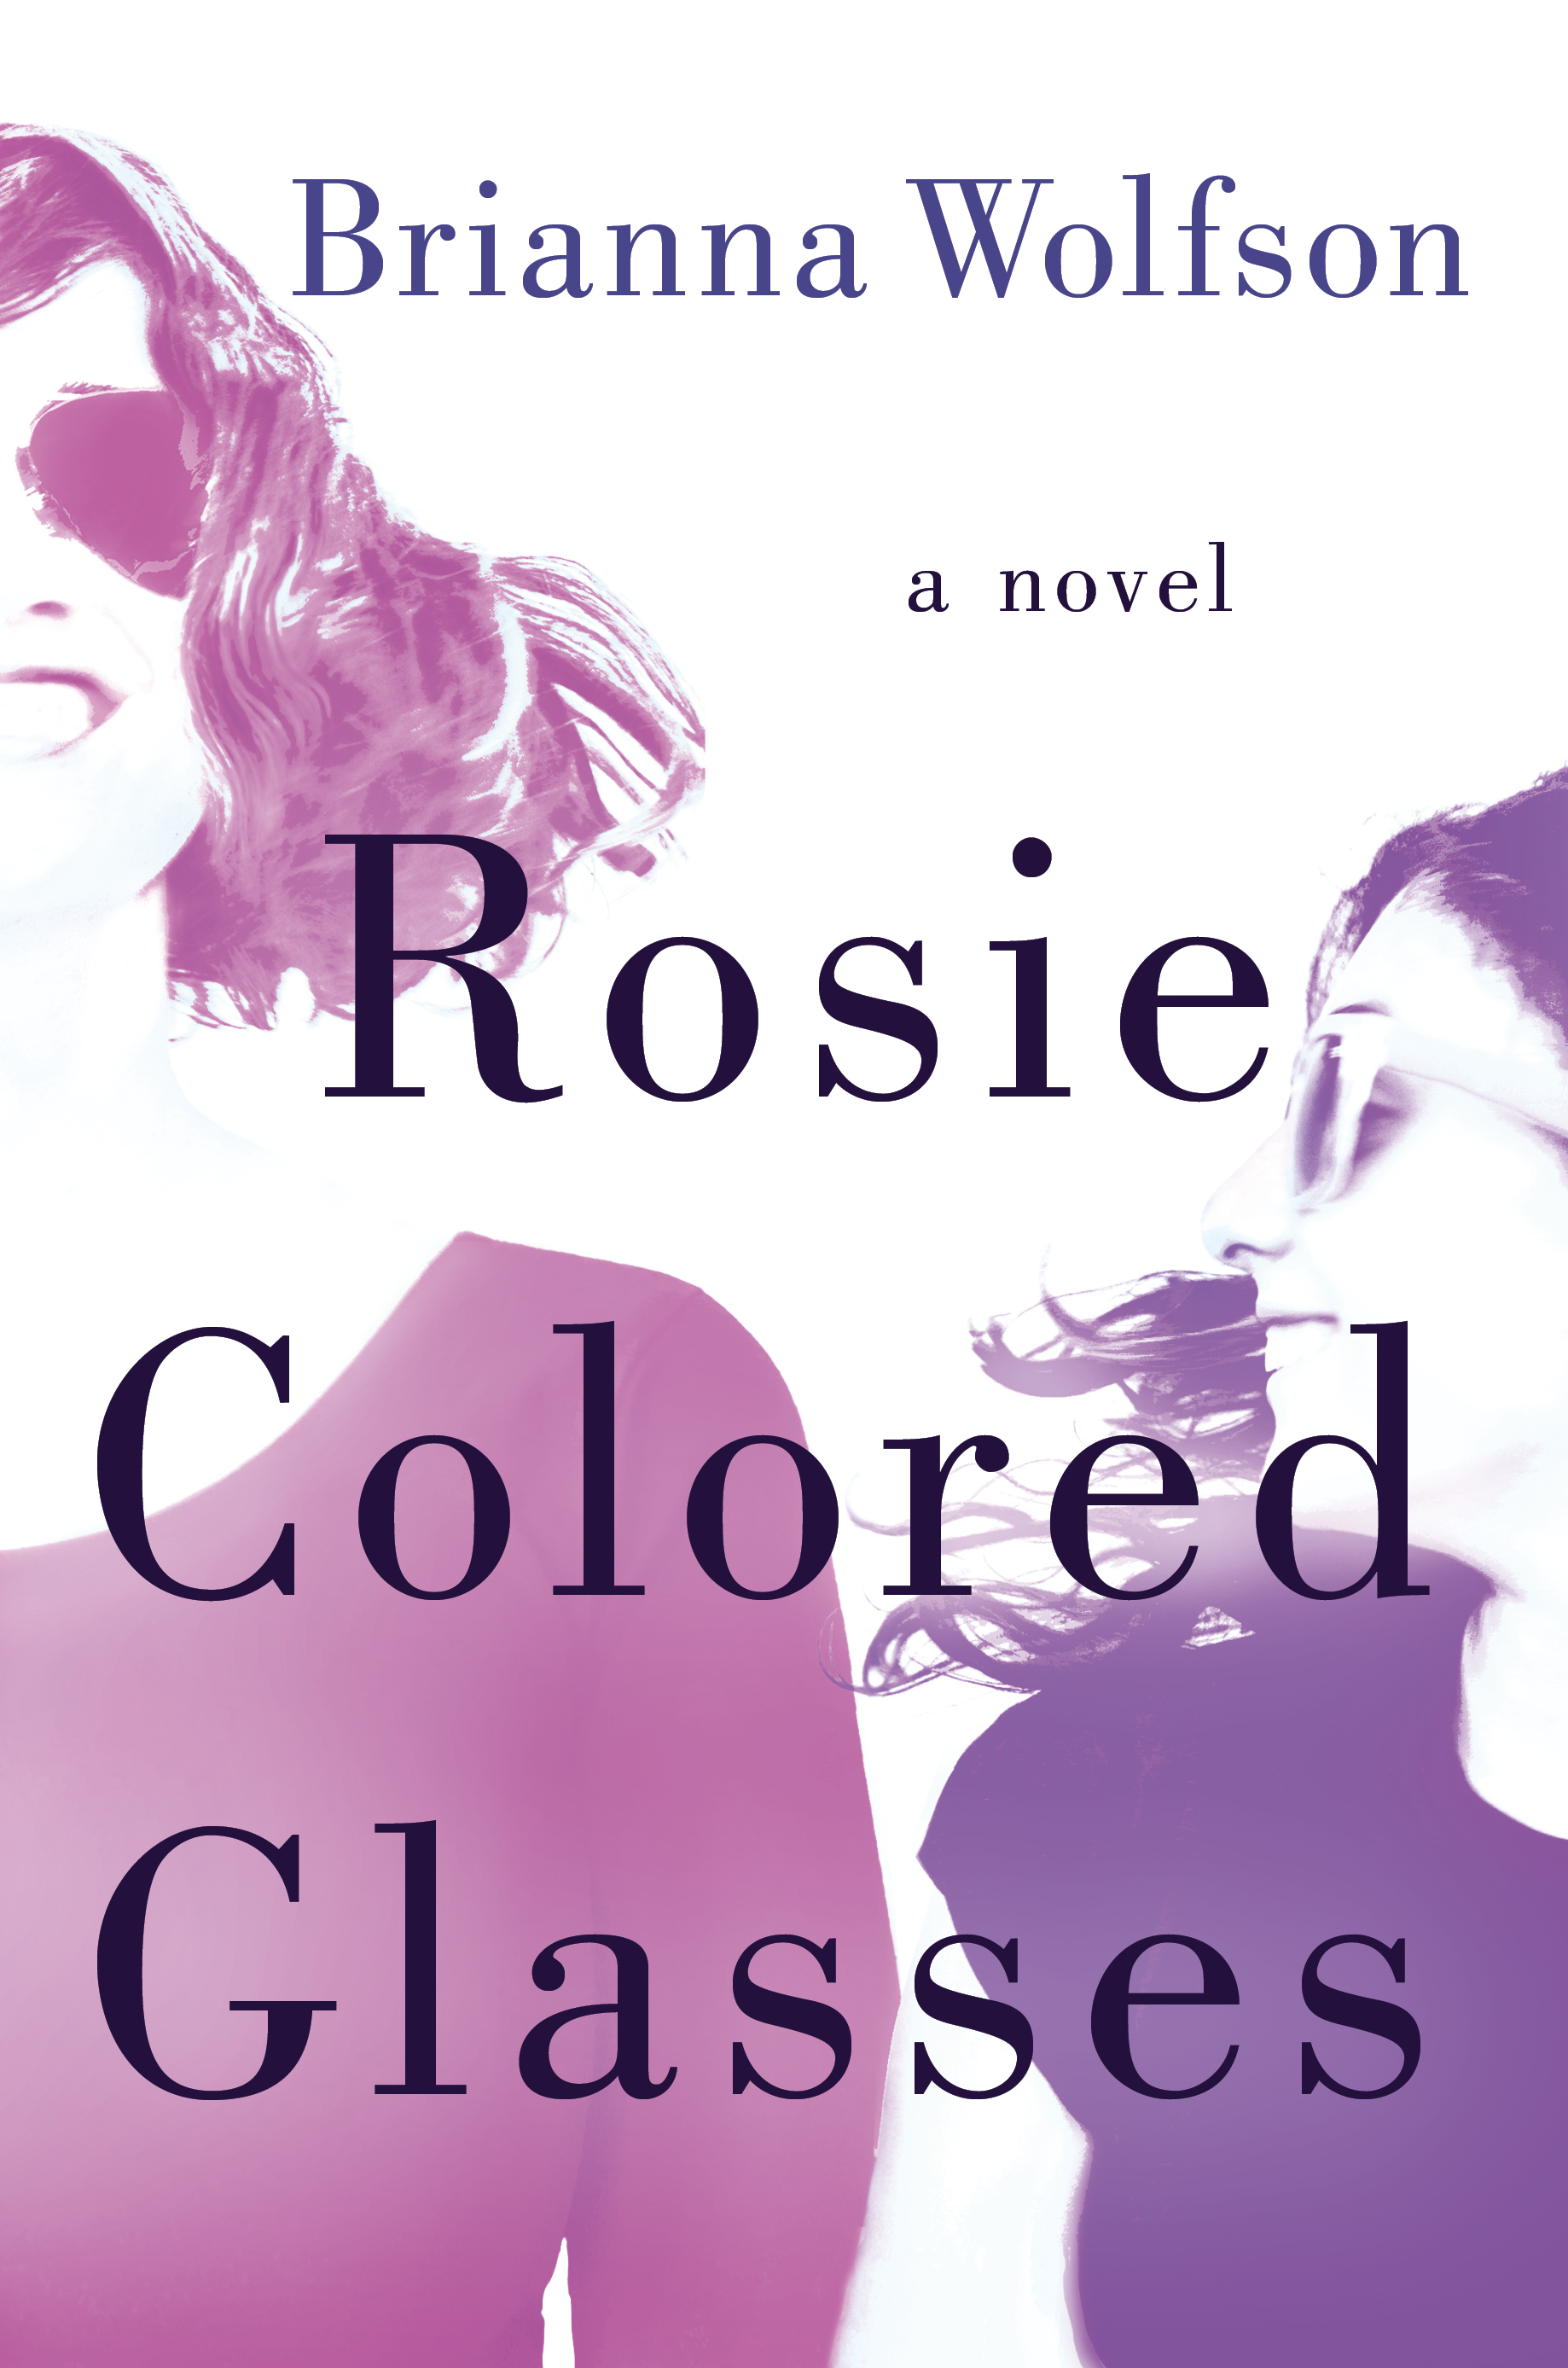 ROSIE COLORED GLASSES Cover – Brianna Wolfson